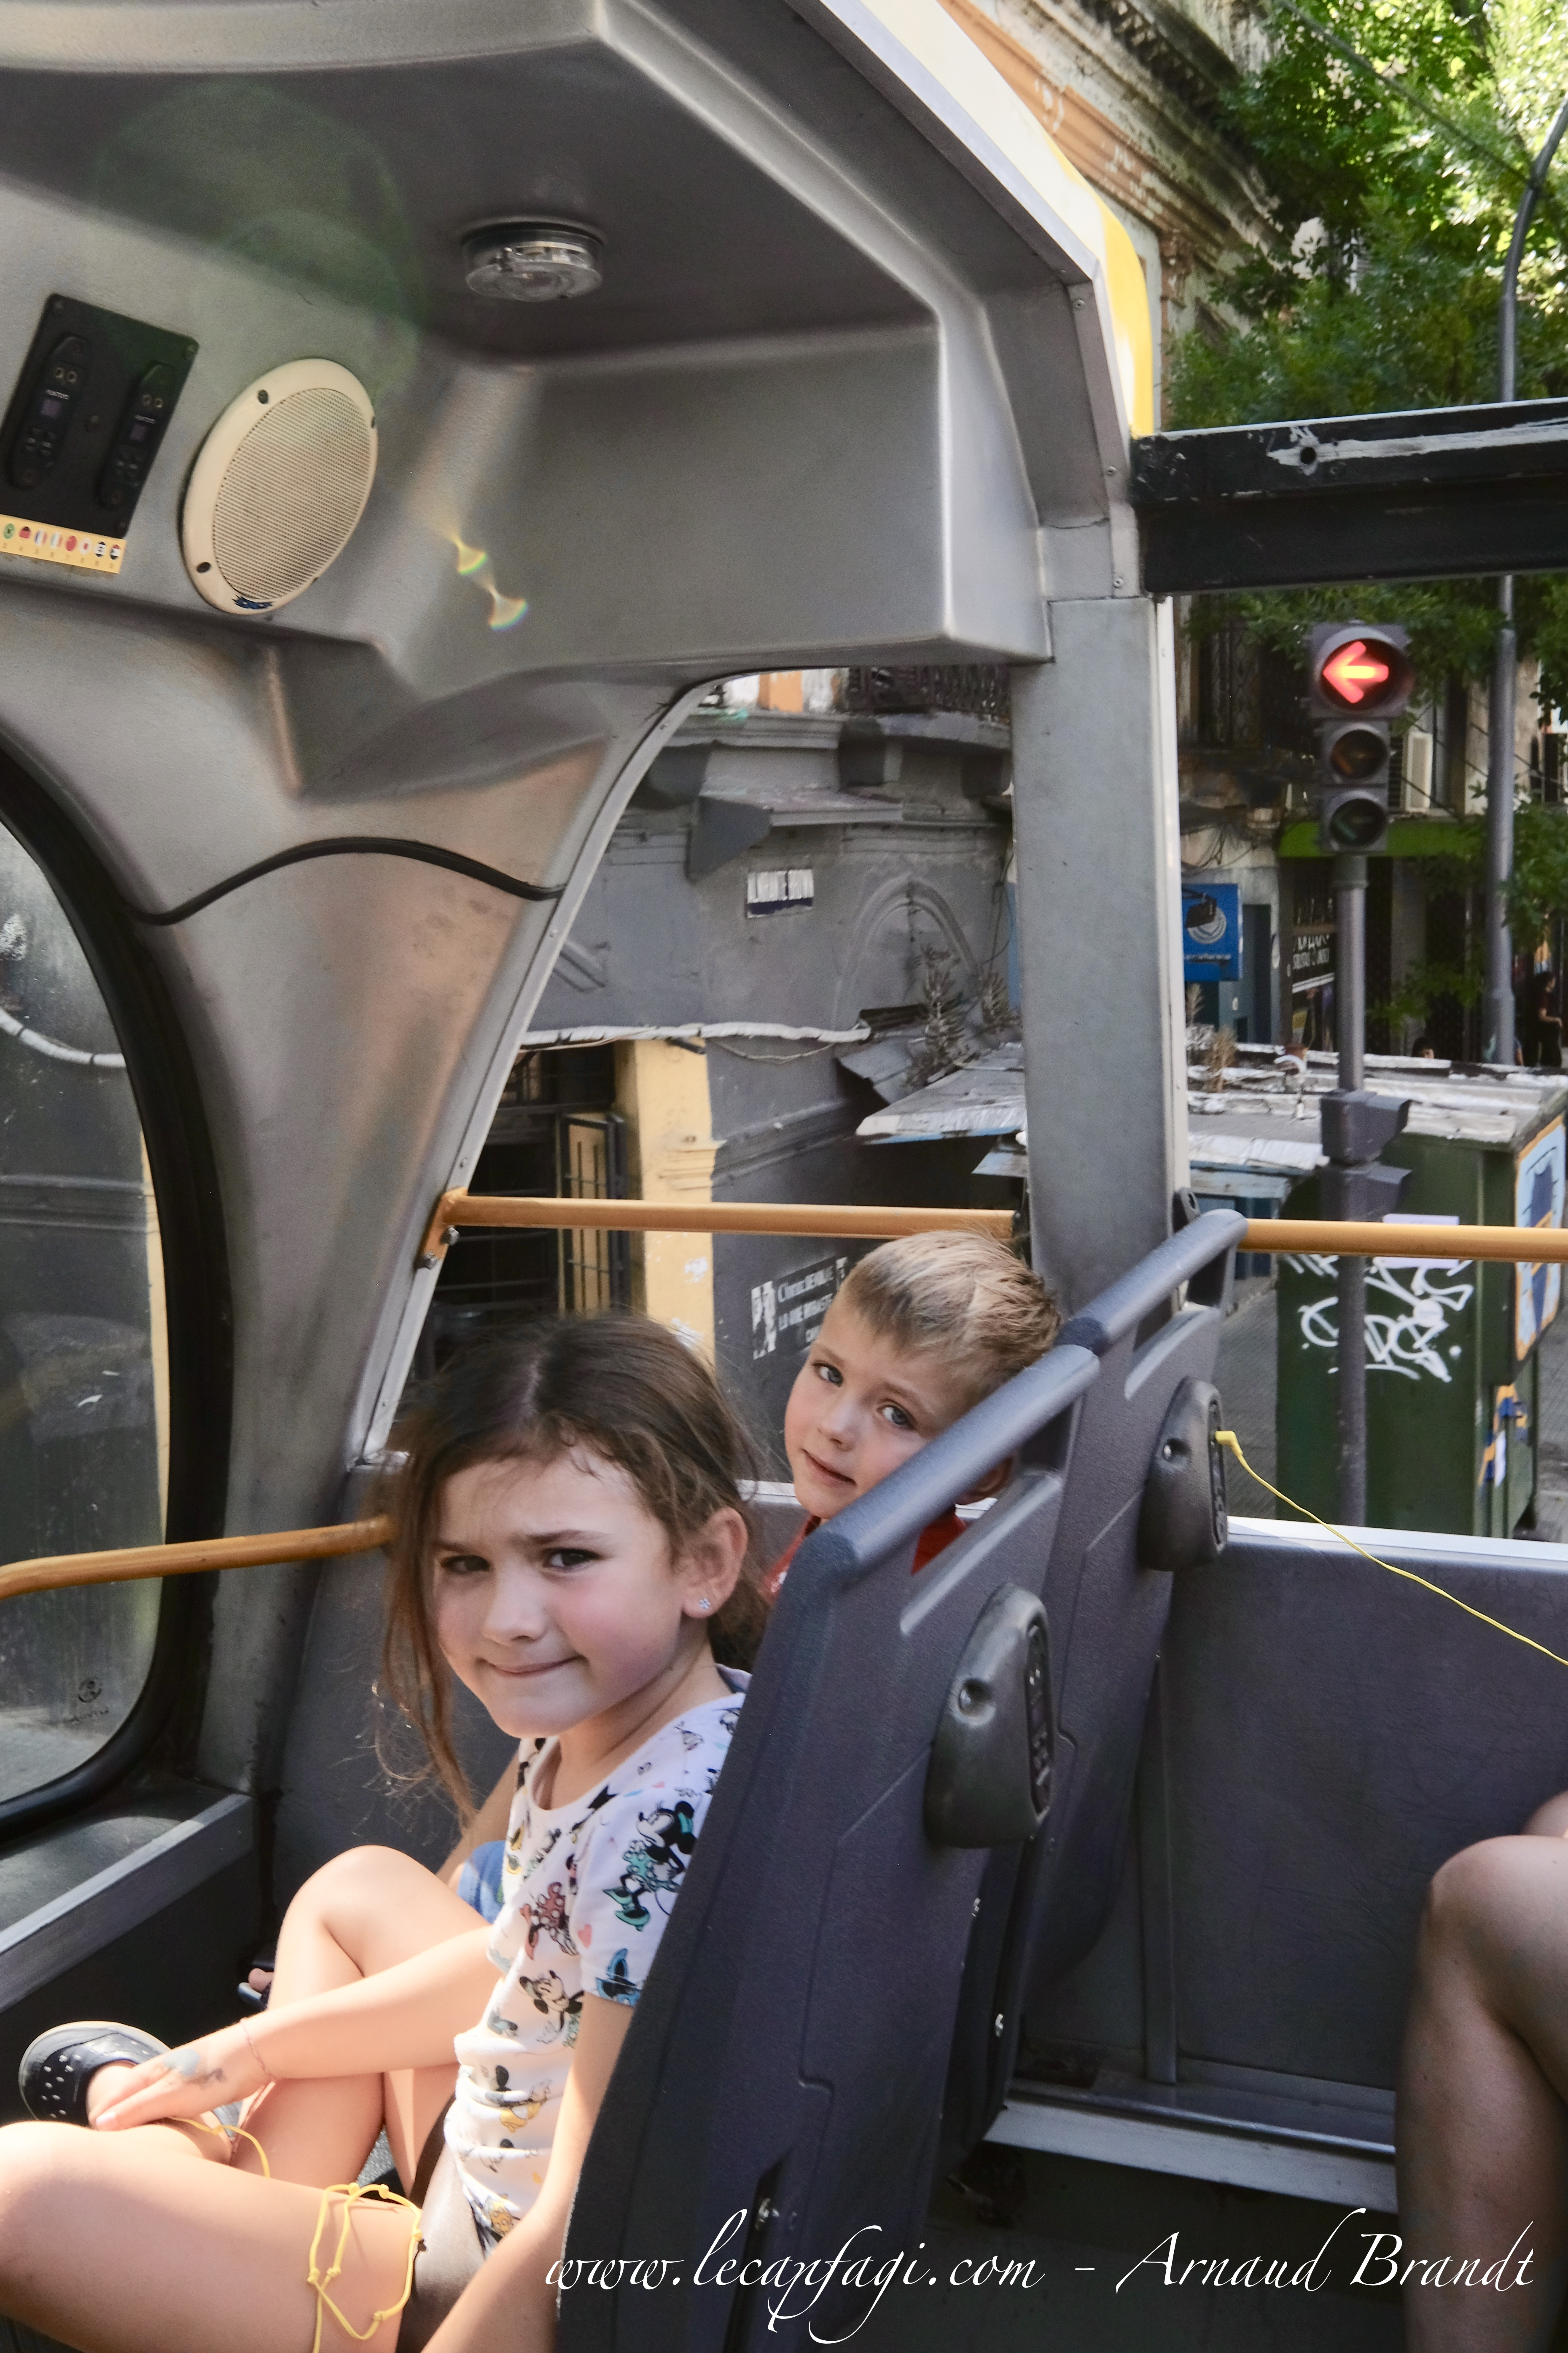 Buenos Aires hop-on-hop-off bus tour